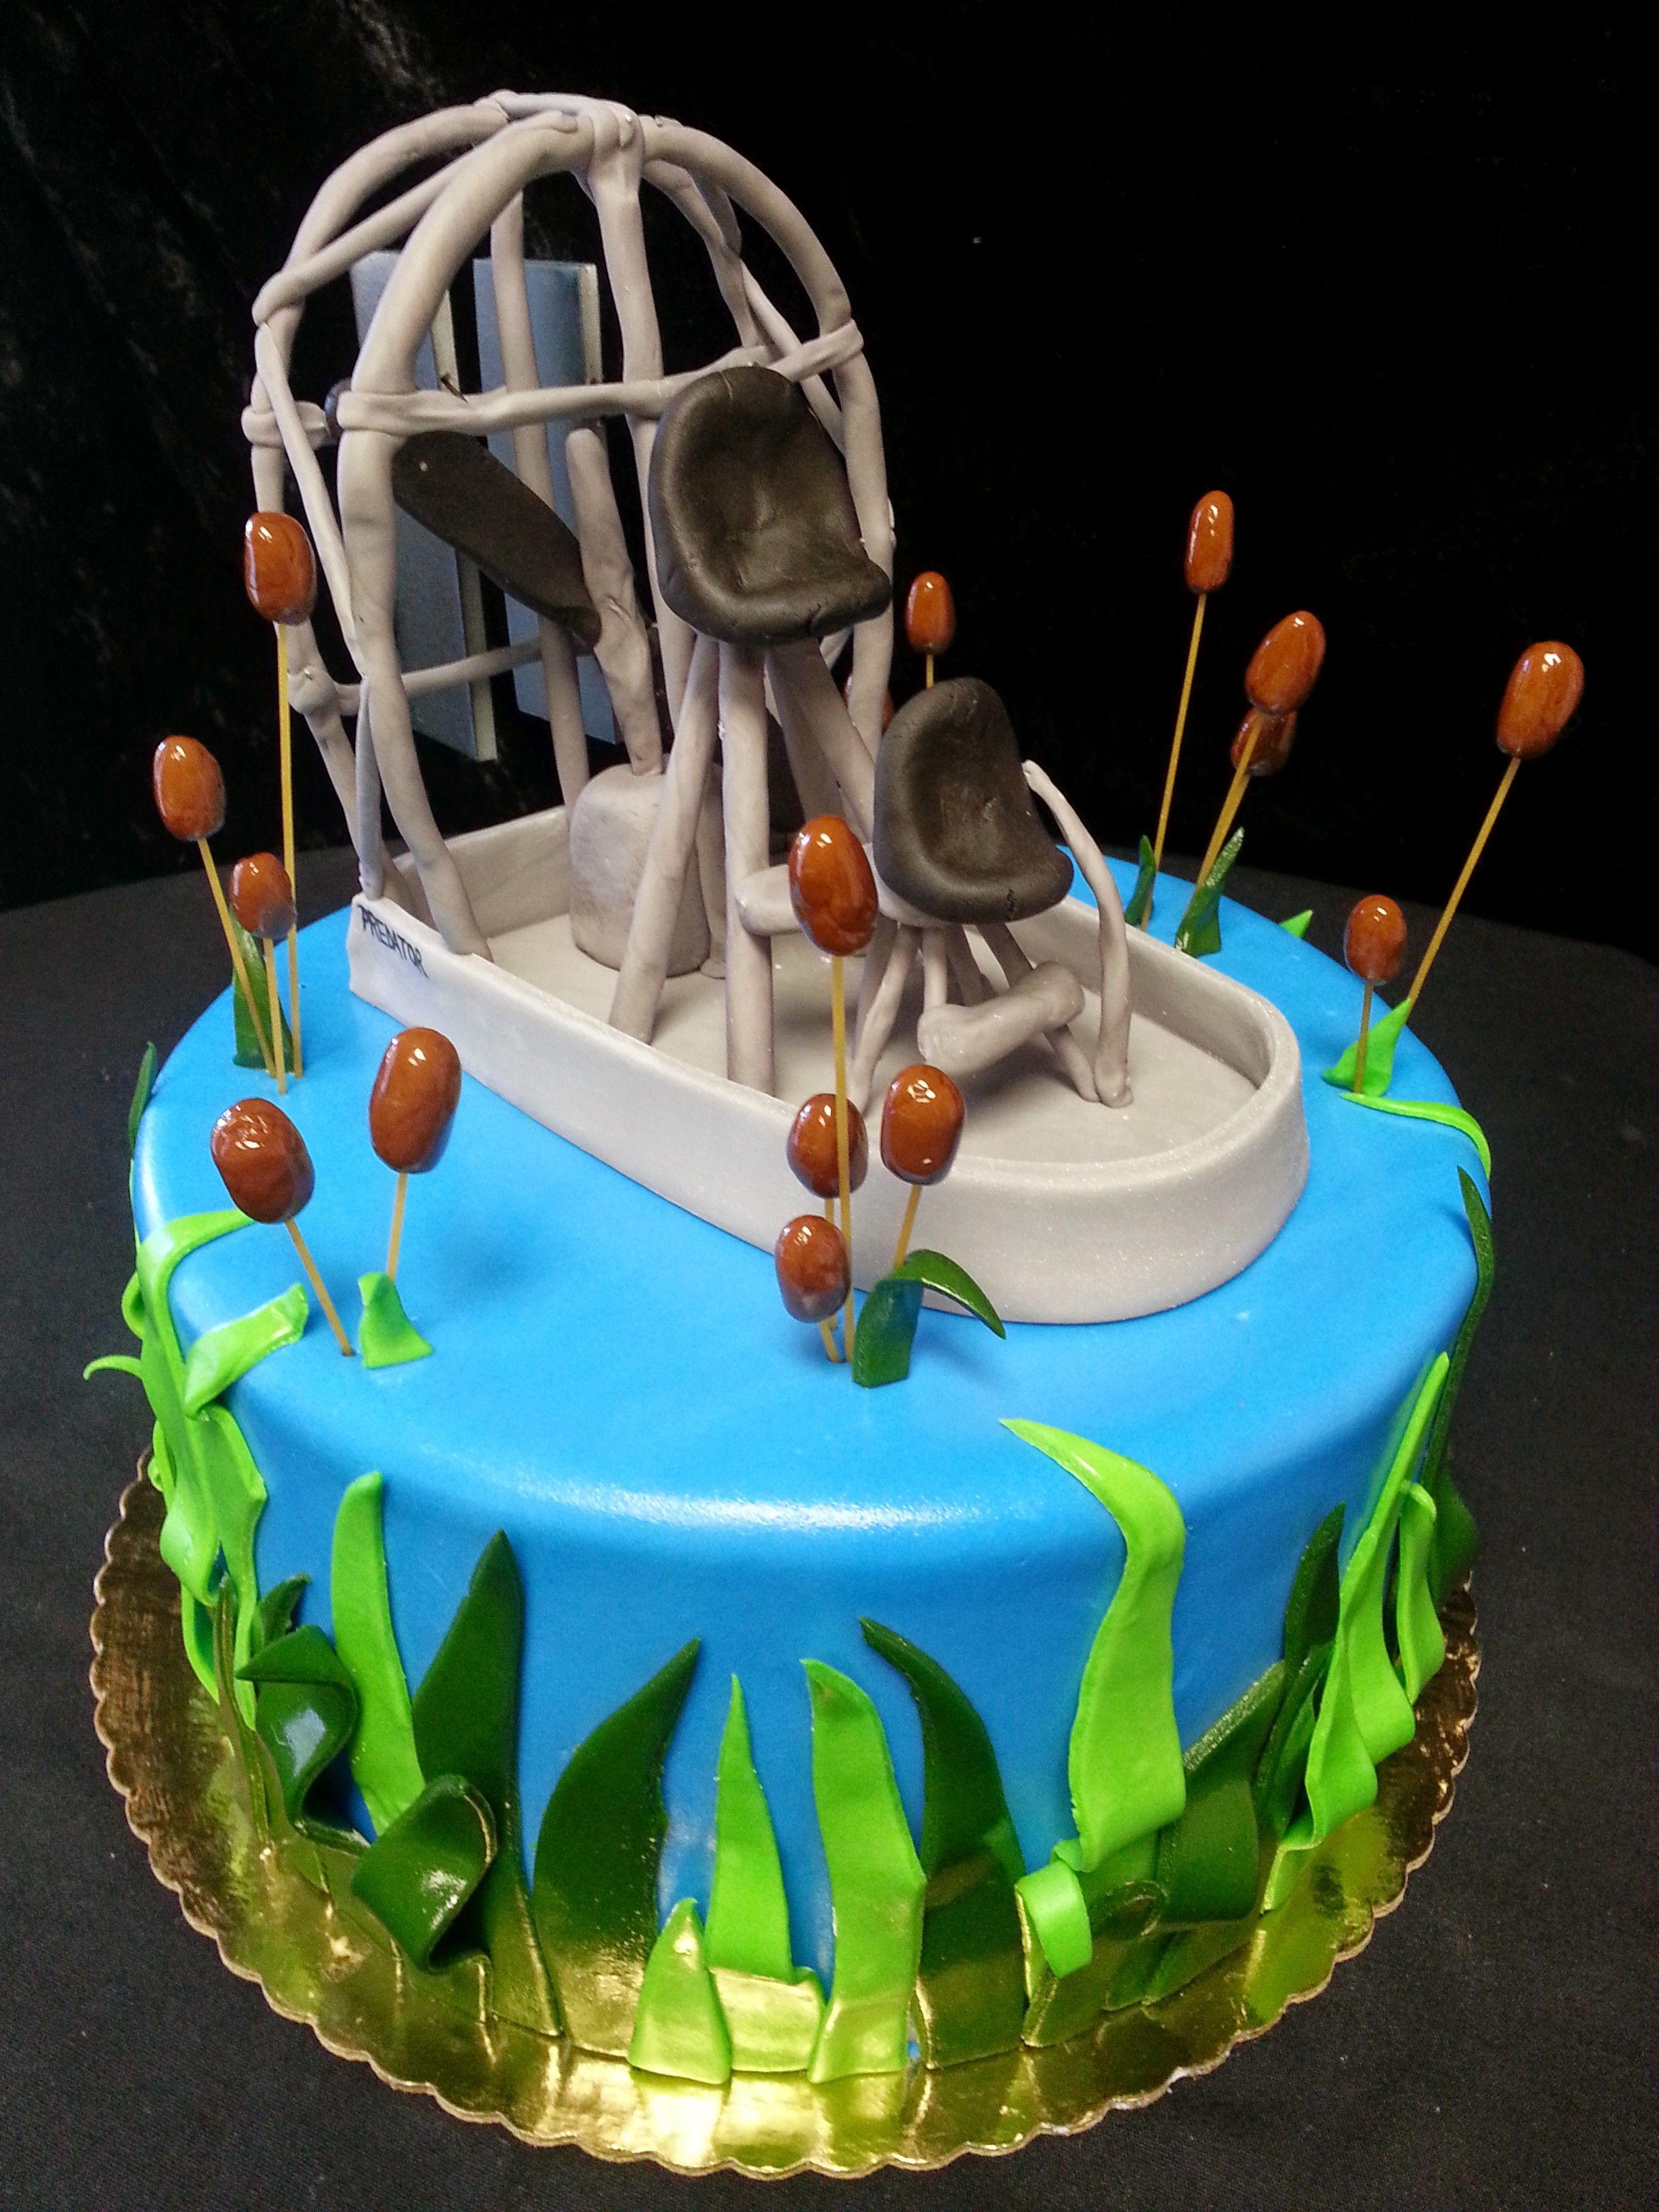 Cookie Jar Bakeshop I Custom Cakes I Grooms Cake I Airboat Grooms Cake I Everglades Themed Grooms Cake I Swamp Themed Grooms Cake